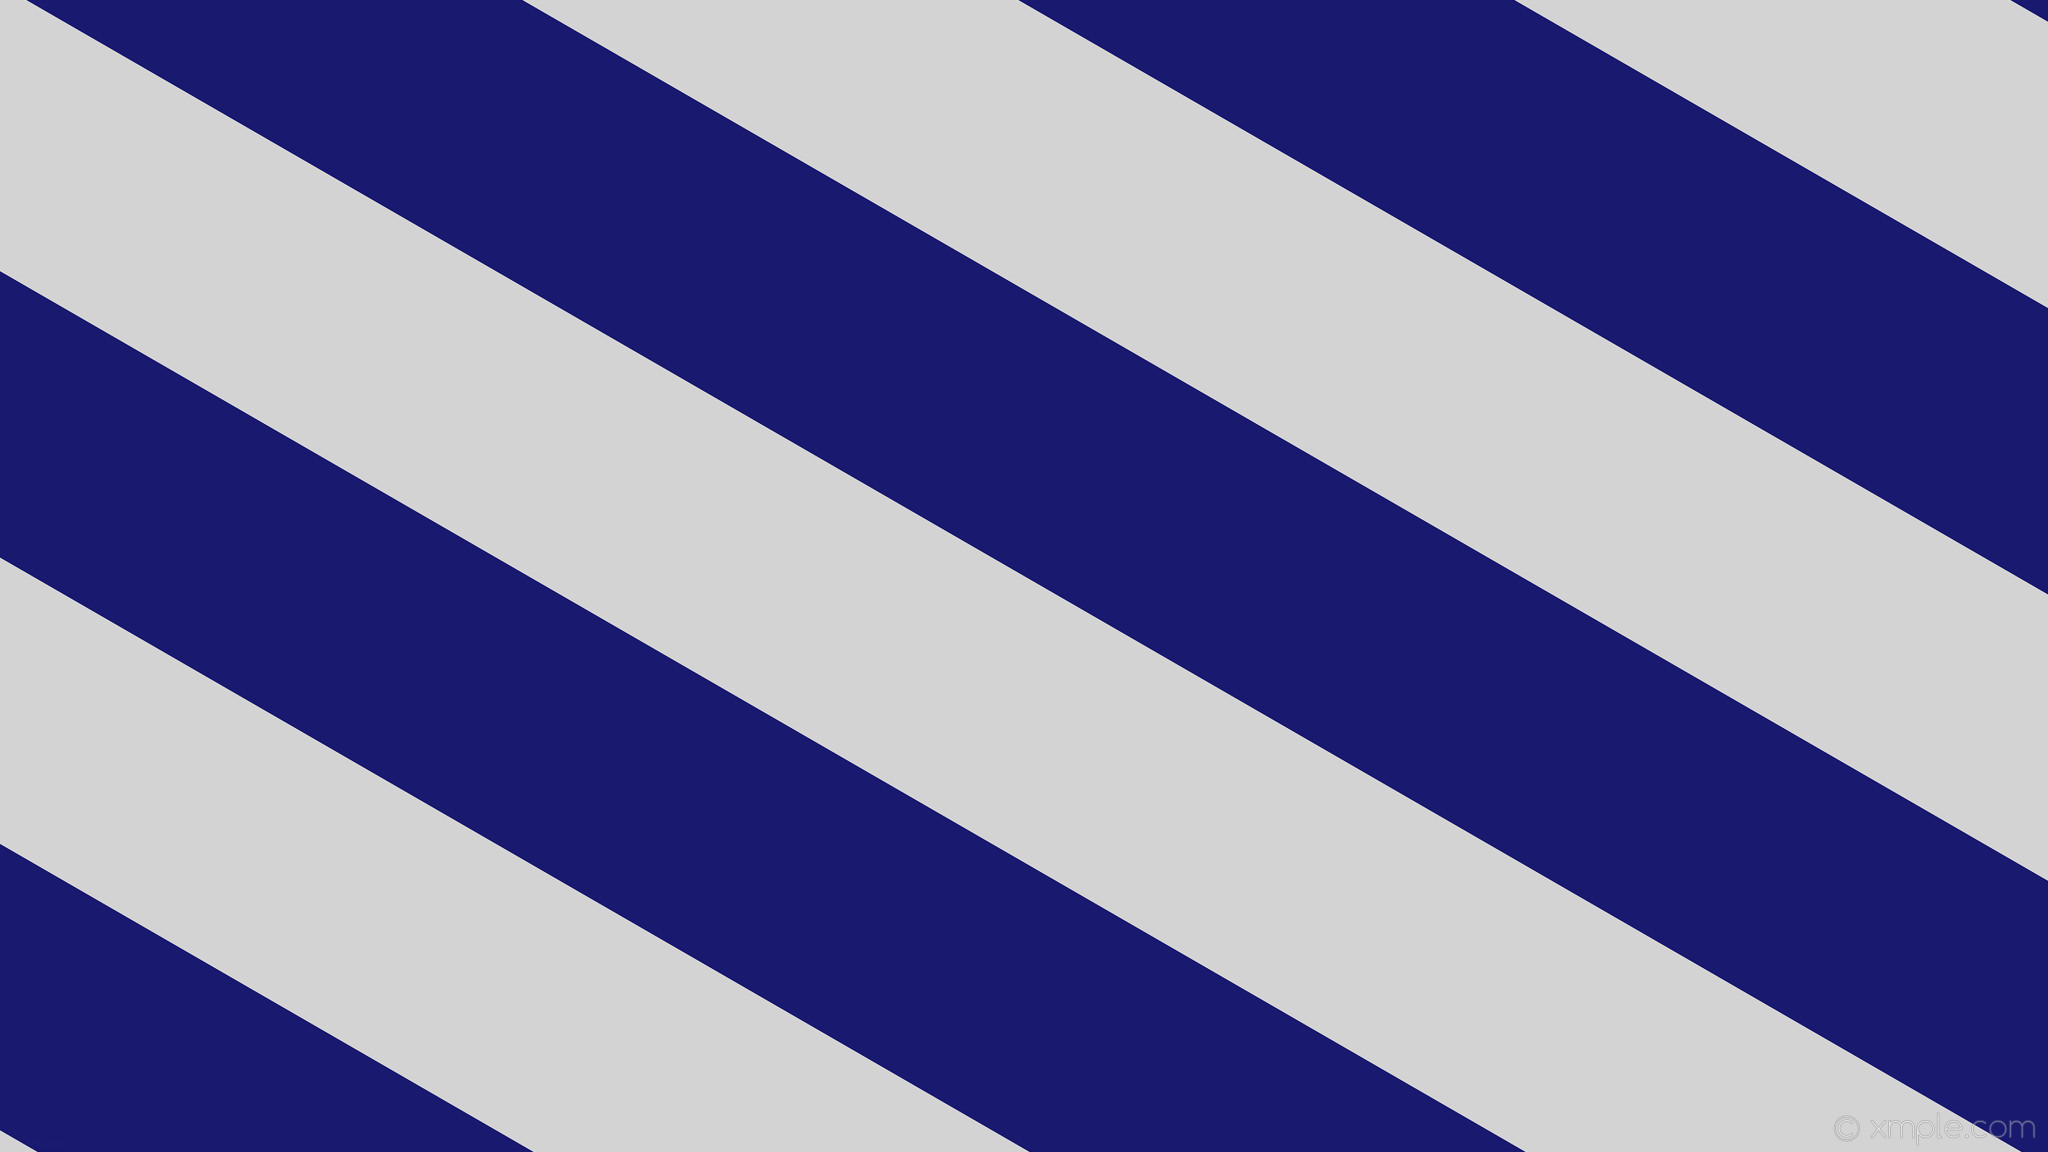 wallpaper streaks blue grey stripes lines midnight blue light gray #191970  #d3d3d3 diagonal 150